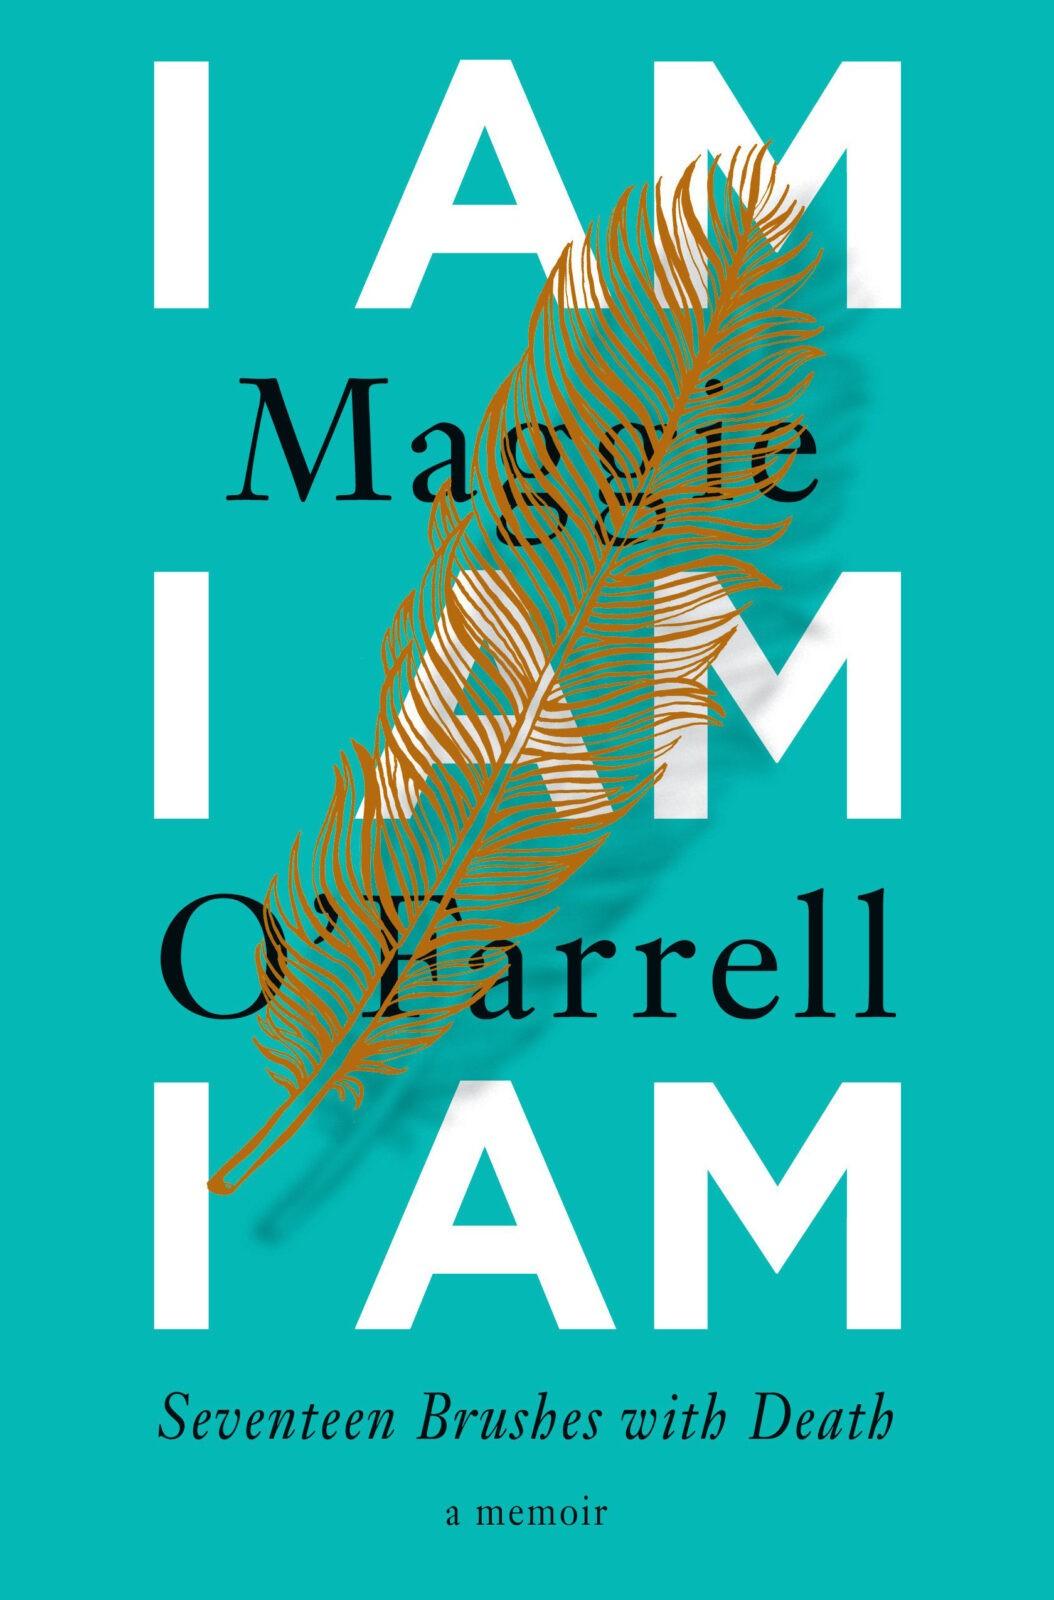 I am I am I am Maggie O'Farrell - Short Stories By Women Toronto 2018 Edit Seven